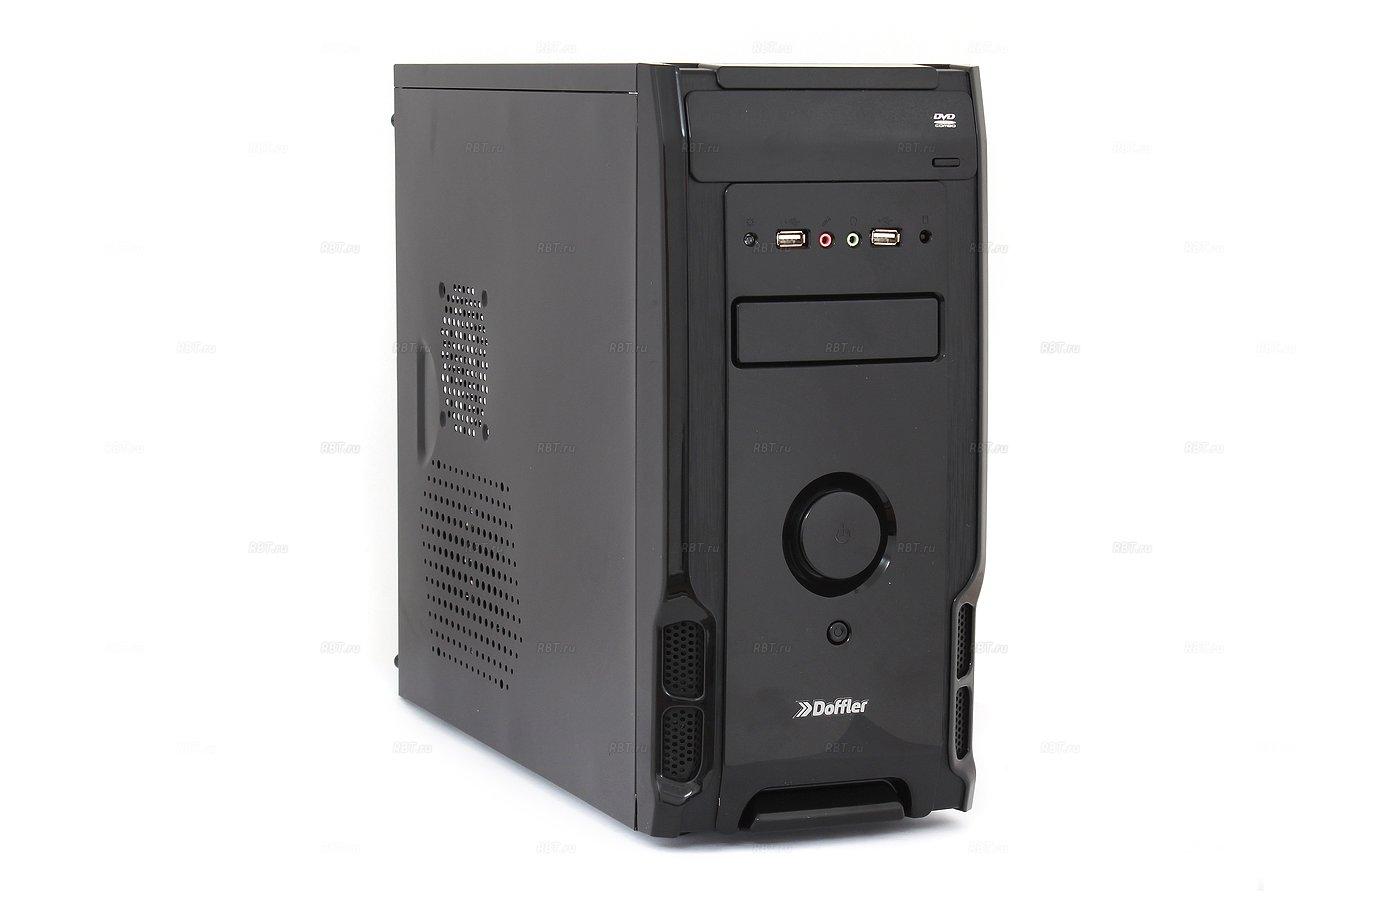 Системный блок Doffler i007R Game intel i5 520m x2 2.40Gh/8Gb/500Gb/R7 350 2Gb/DVDRW/DOS